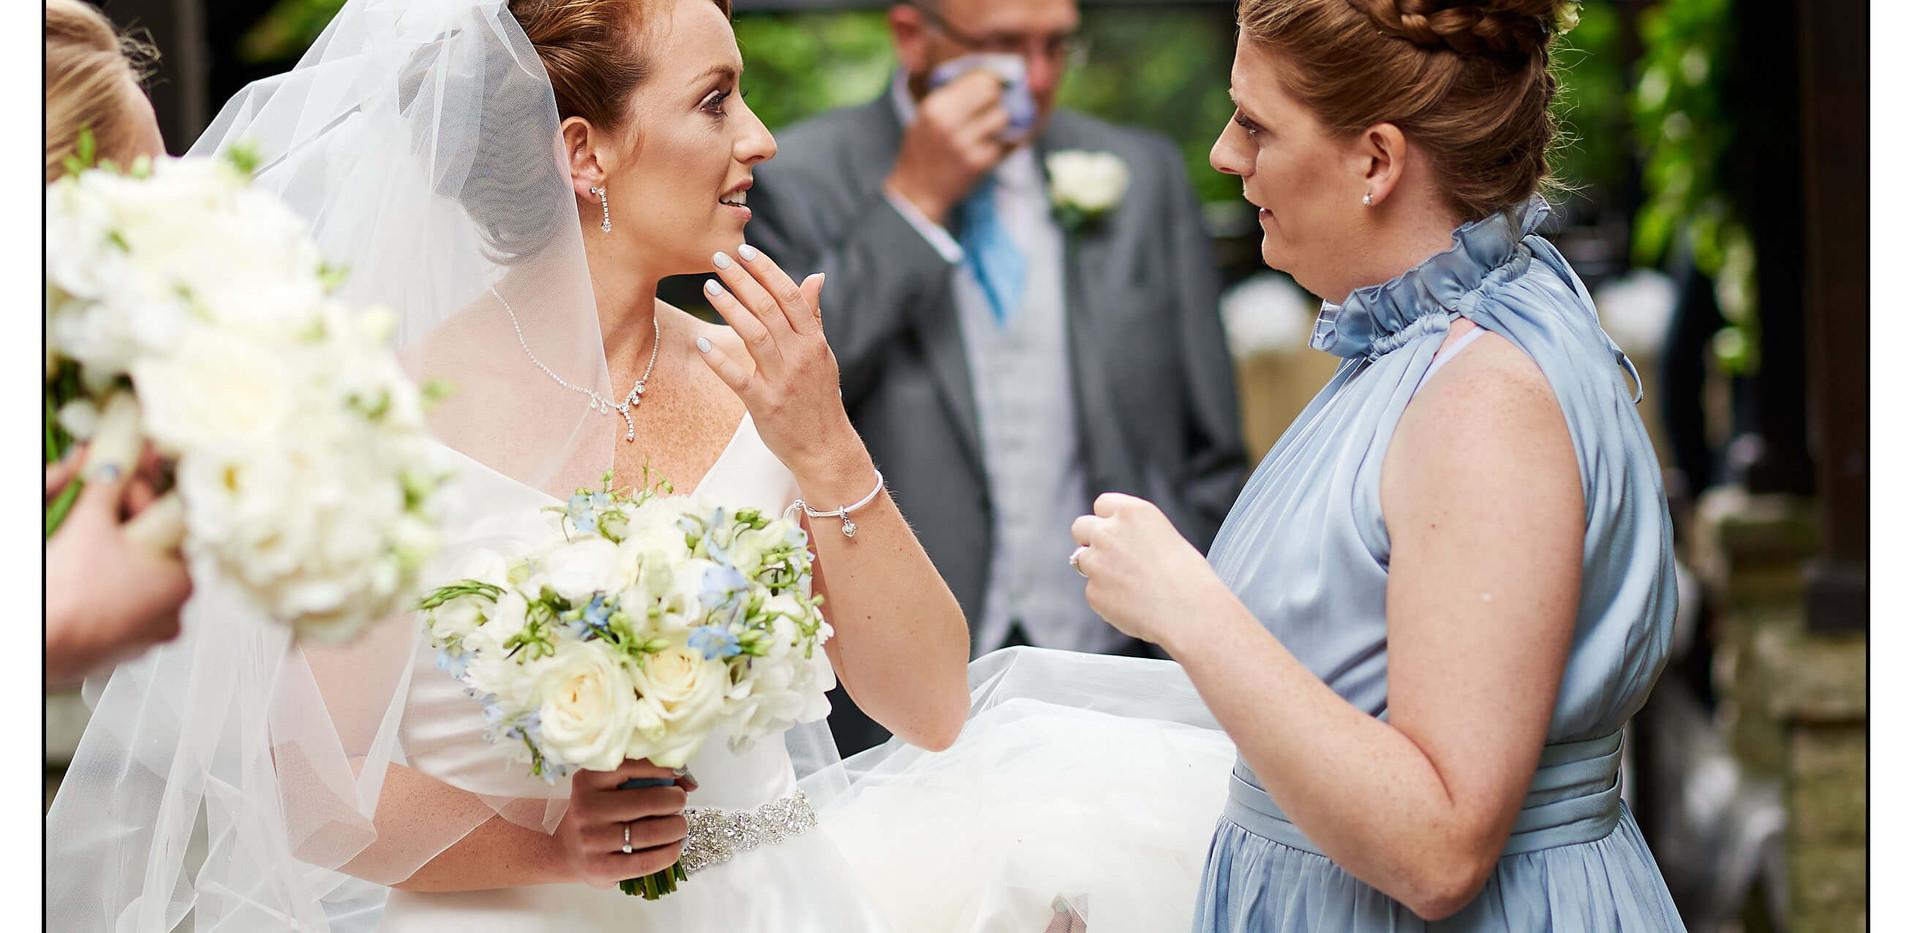 Libra Photographic - Dorset Documentary Style Wedding Photography